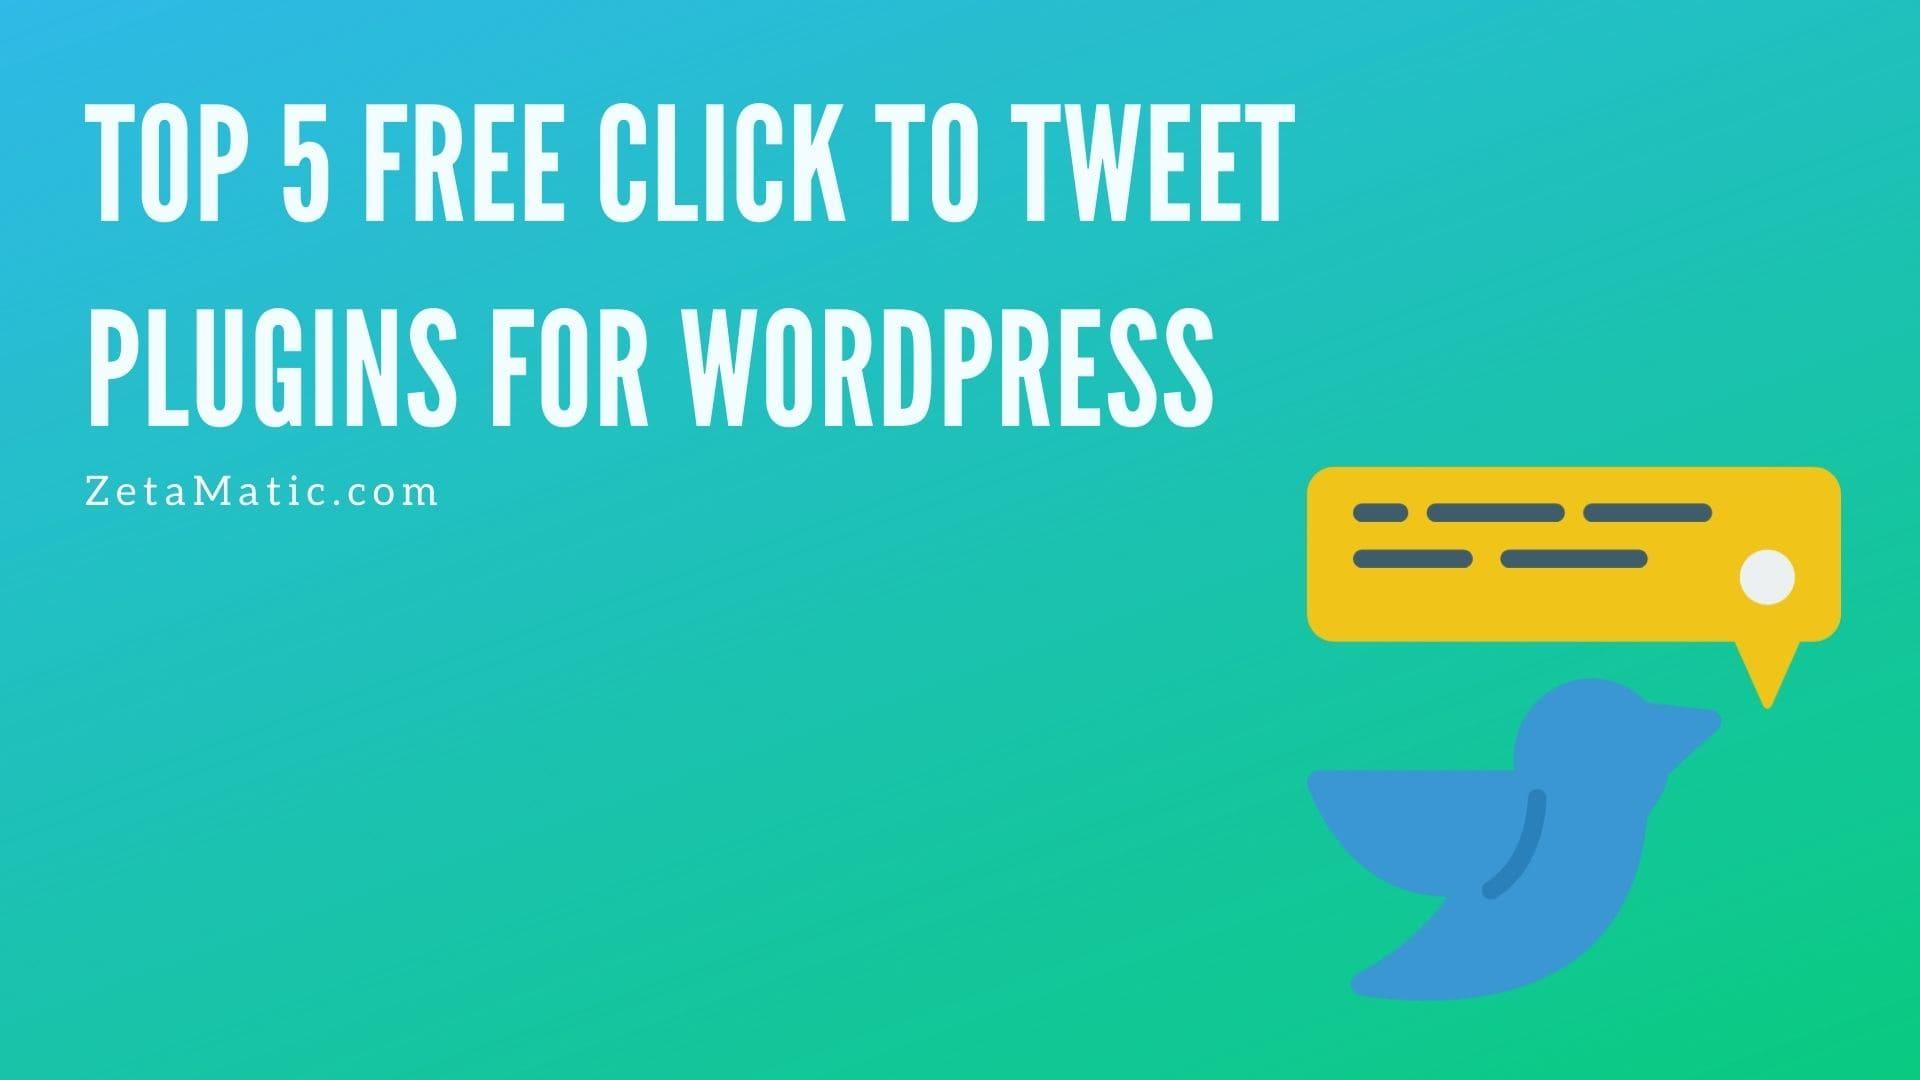 Top 5 Free Click to Tweet Plugins for WordPress